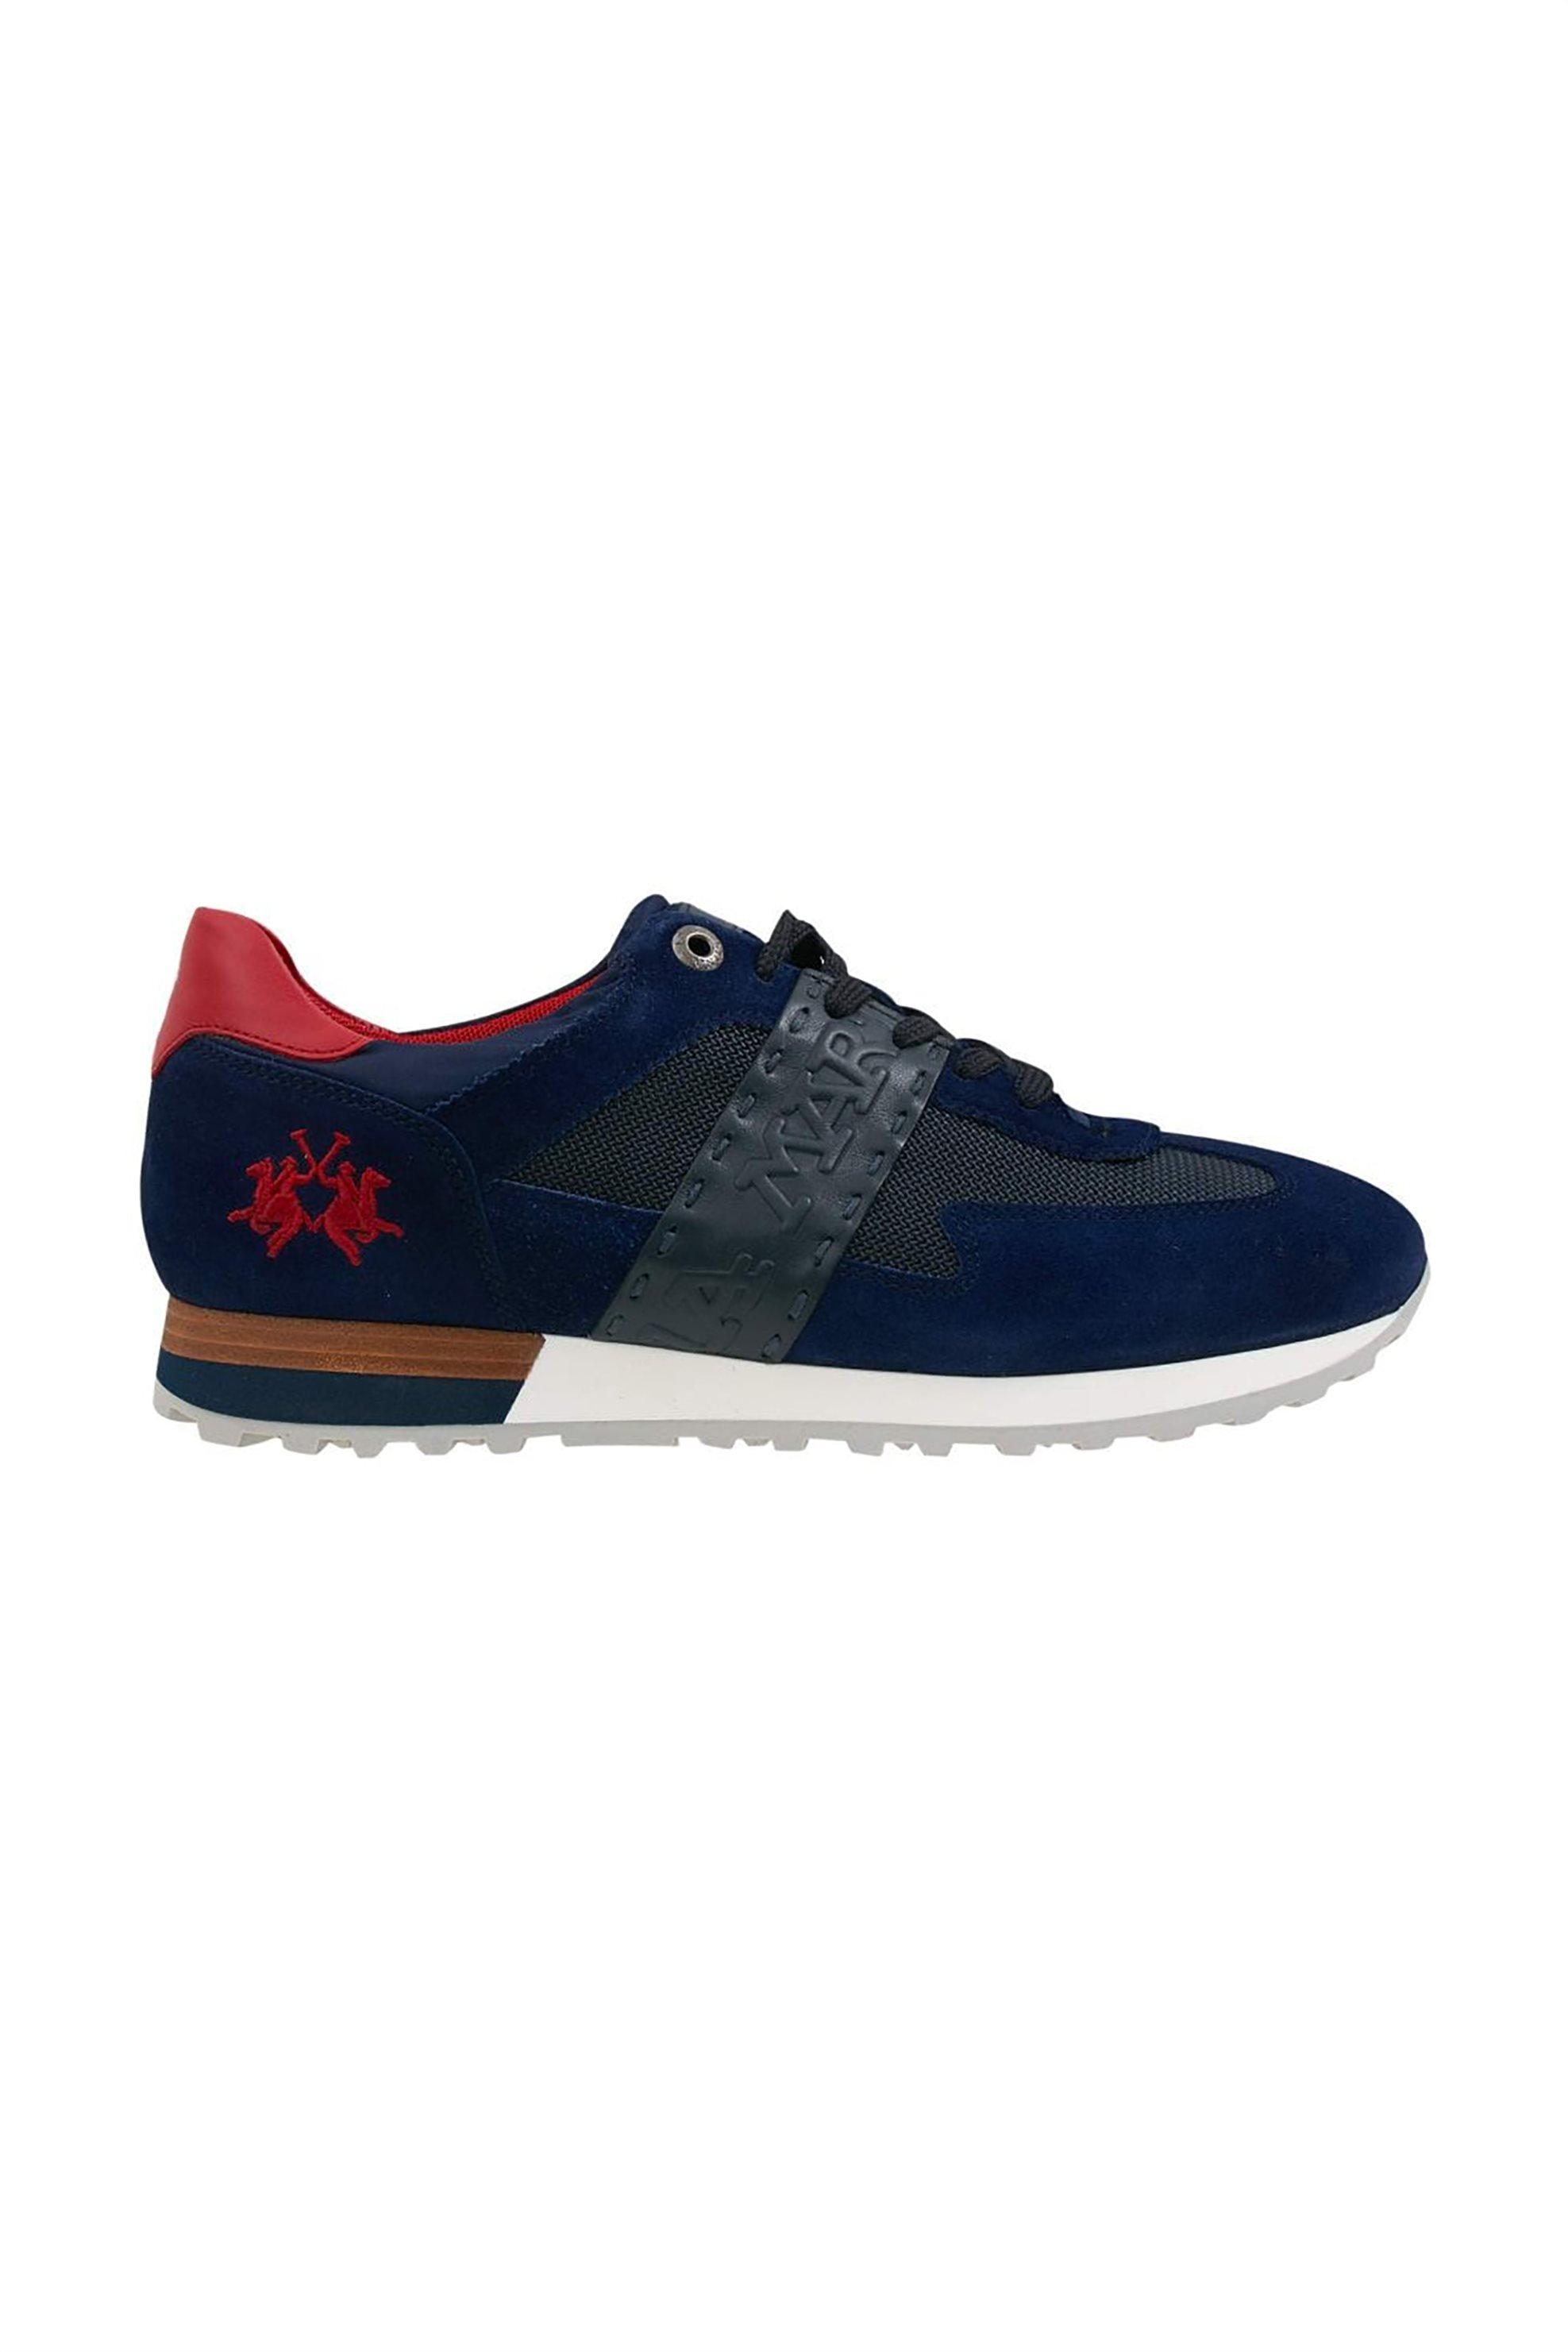 La Martina ανδρικά sneakers με suede στοιχεία και κεντημένο logo – LFM211061-2160 – Μπλε Σκούρο